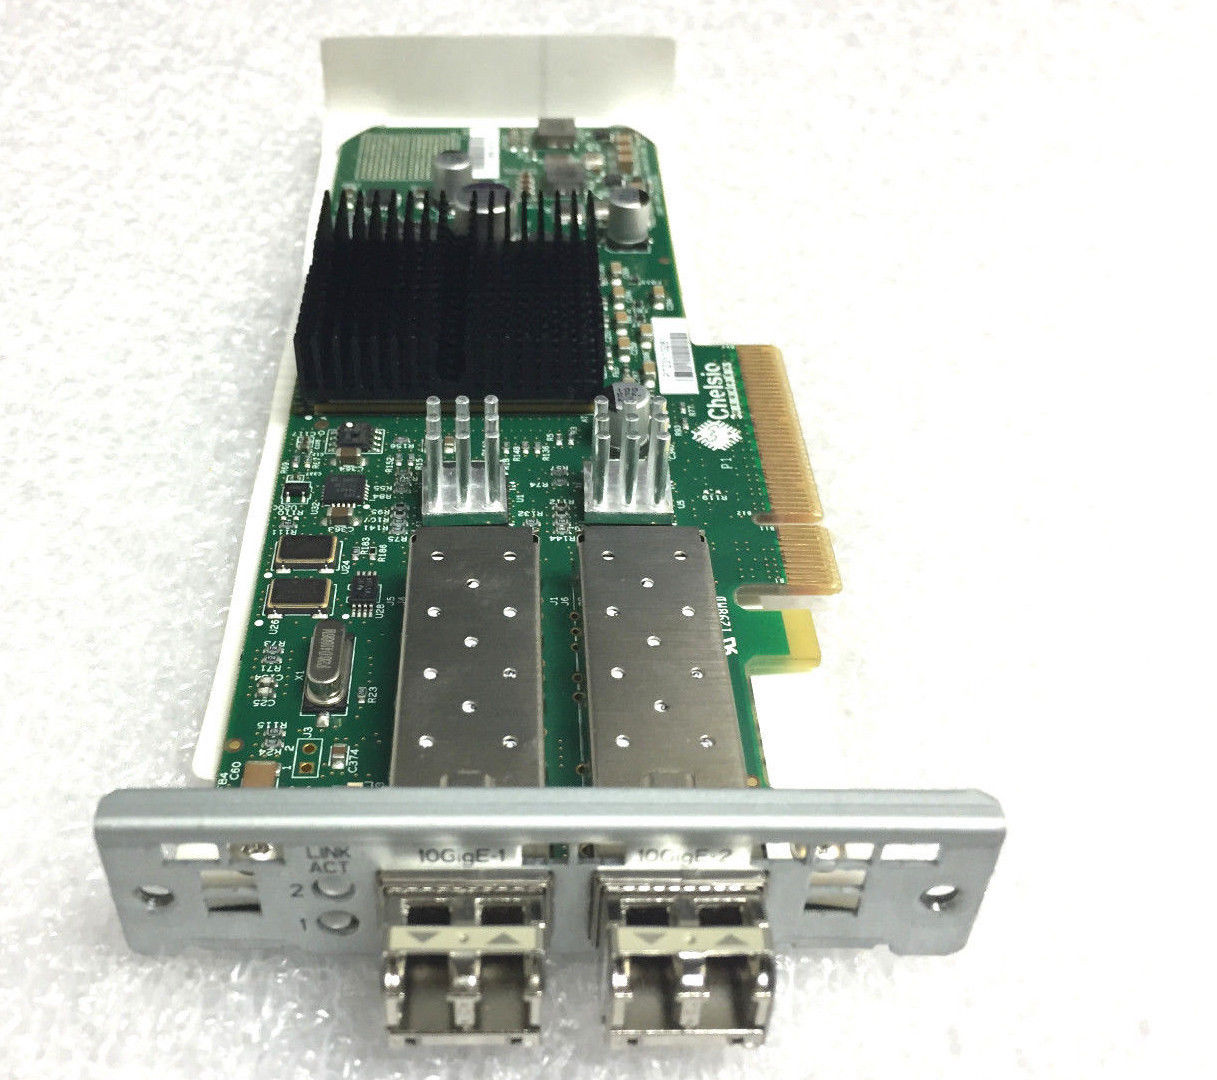 Chelsio Comunications 10GB 2-Port PCI-E Opt Adapter Card (110-1088-30)